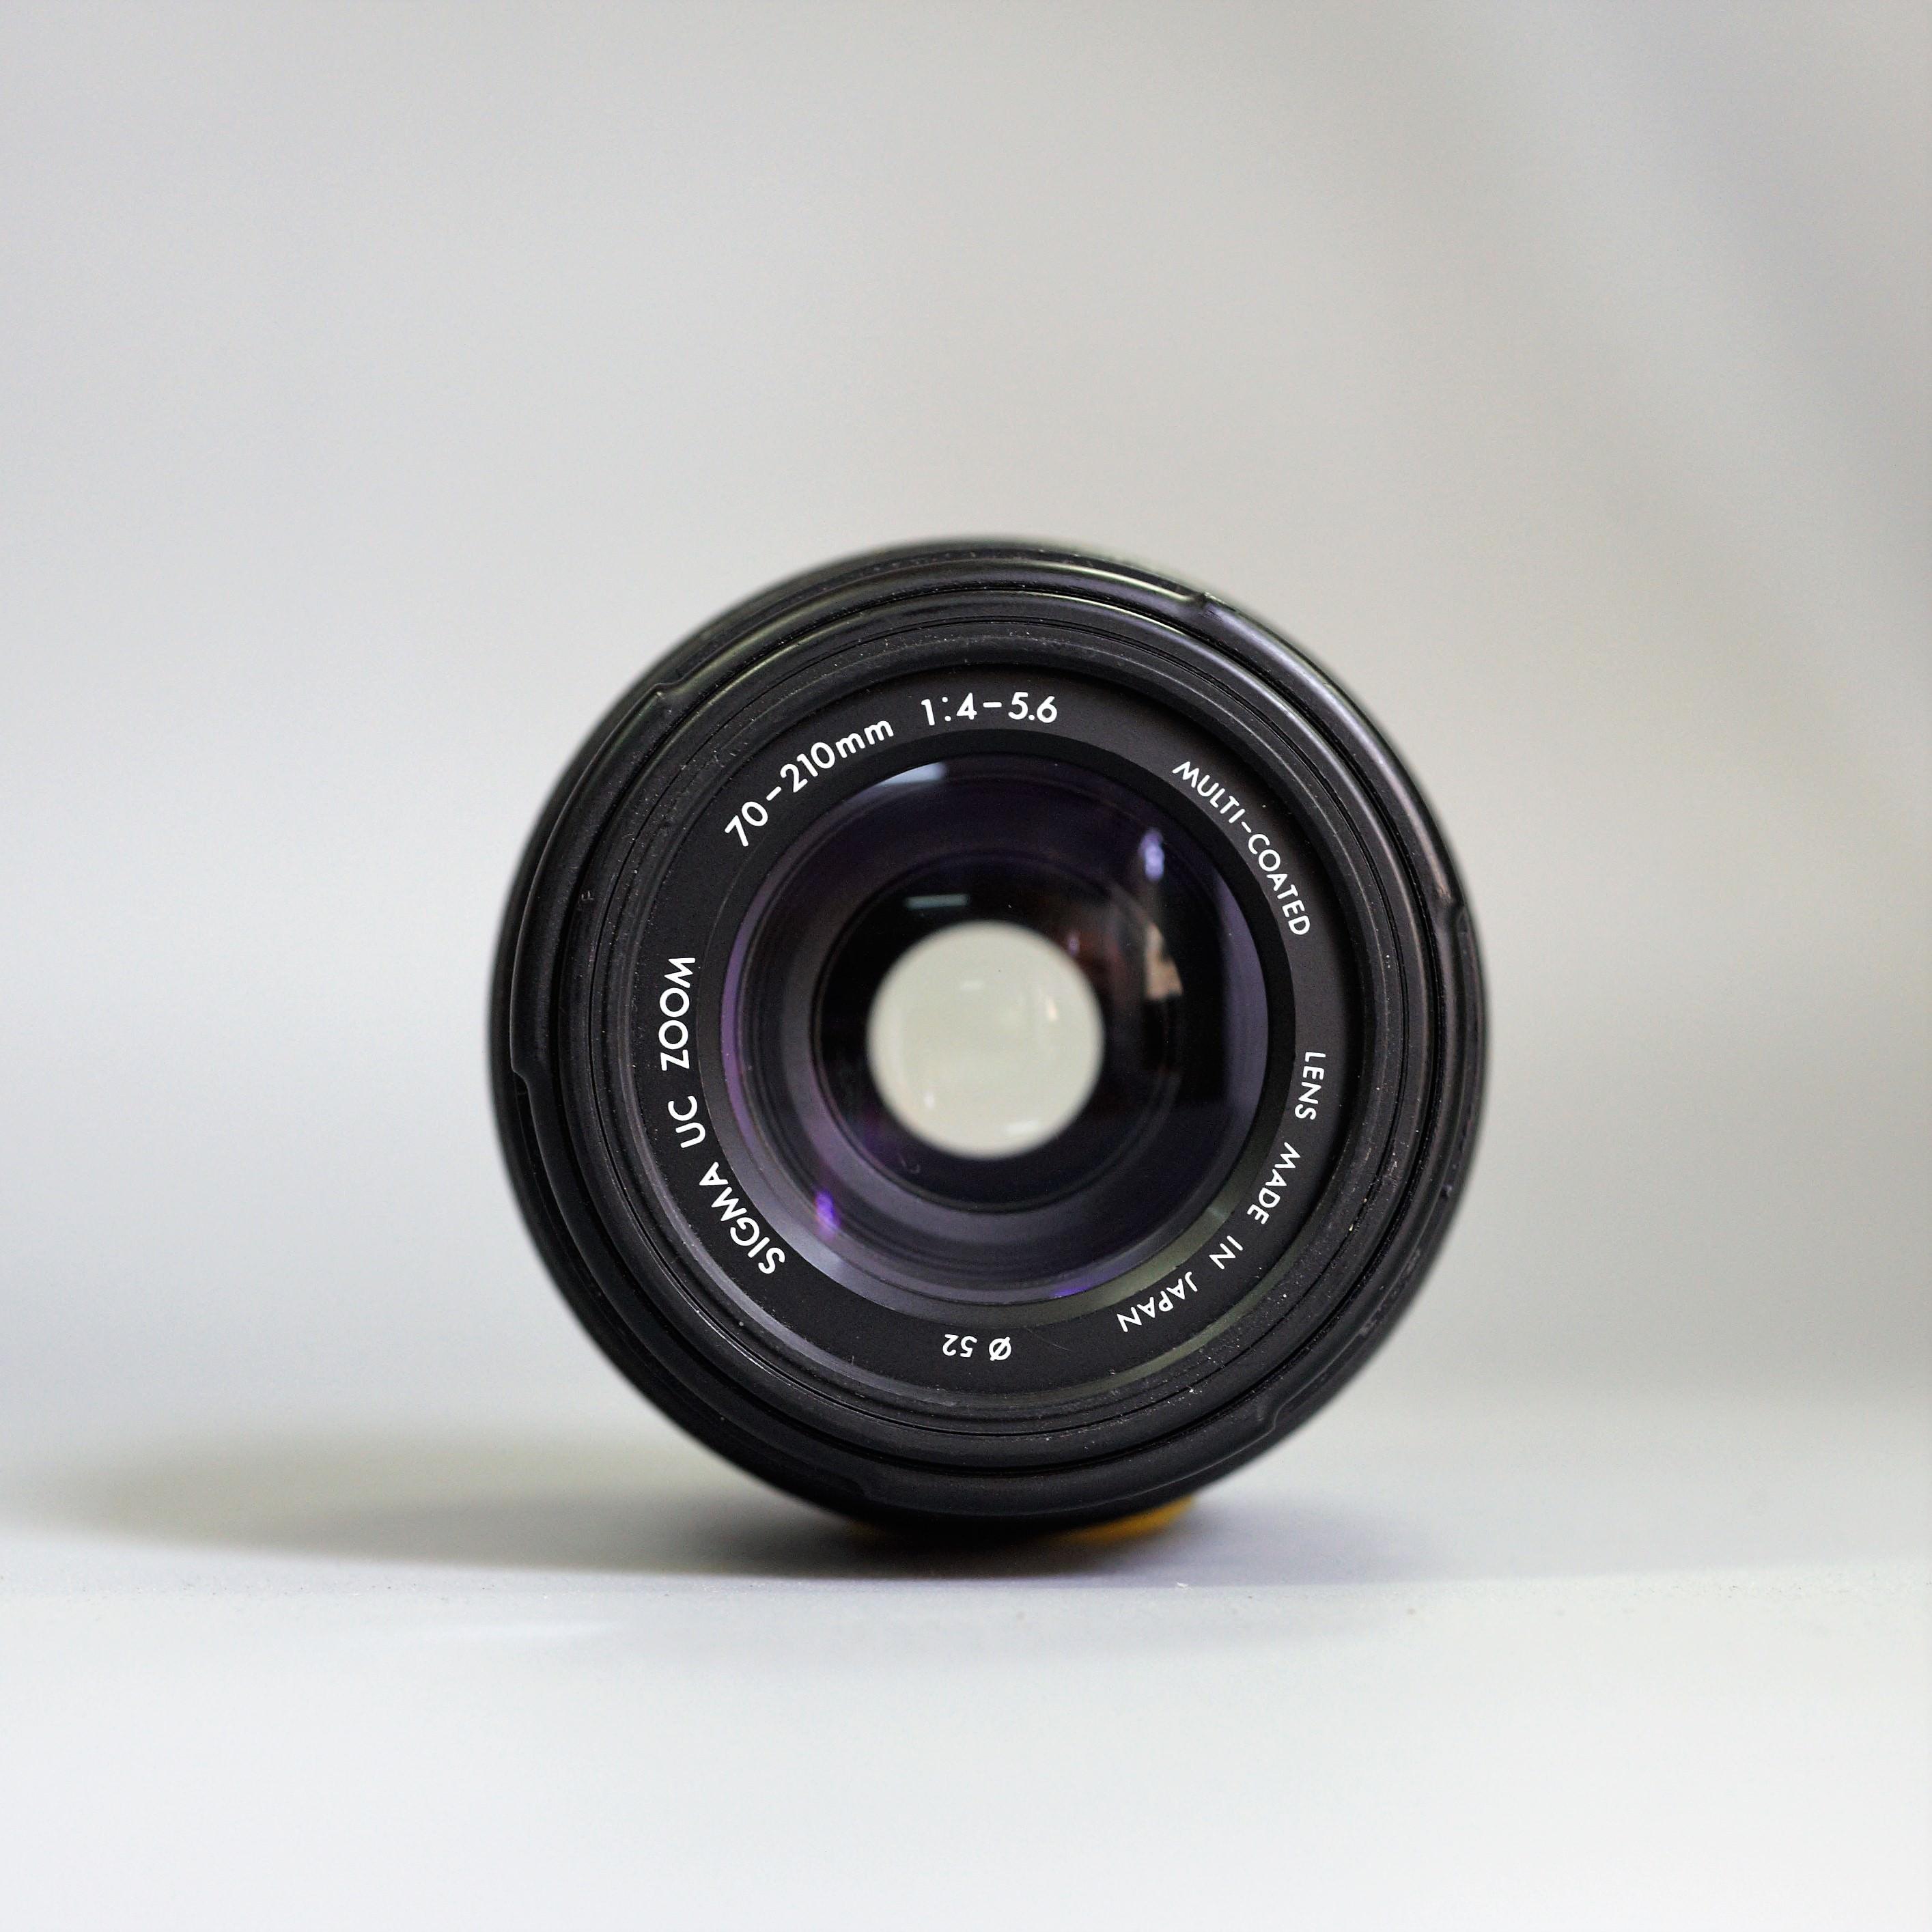 sigma-70-210mm-f4-5-6-af-canon-sigma-70-210-4-5-6-10326